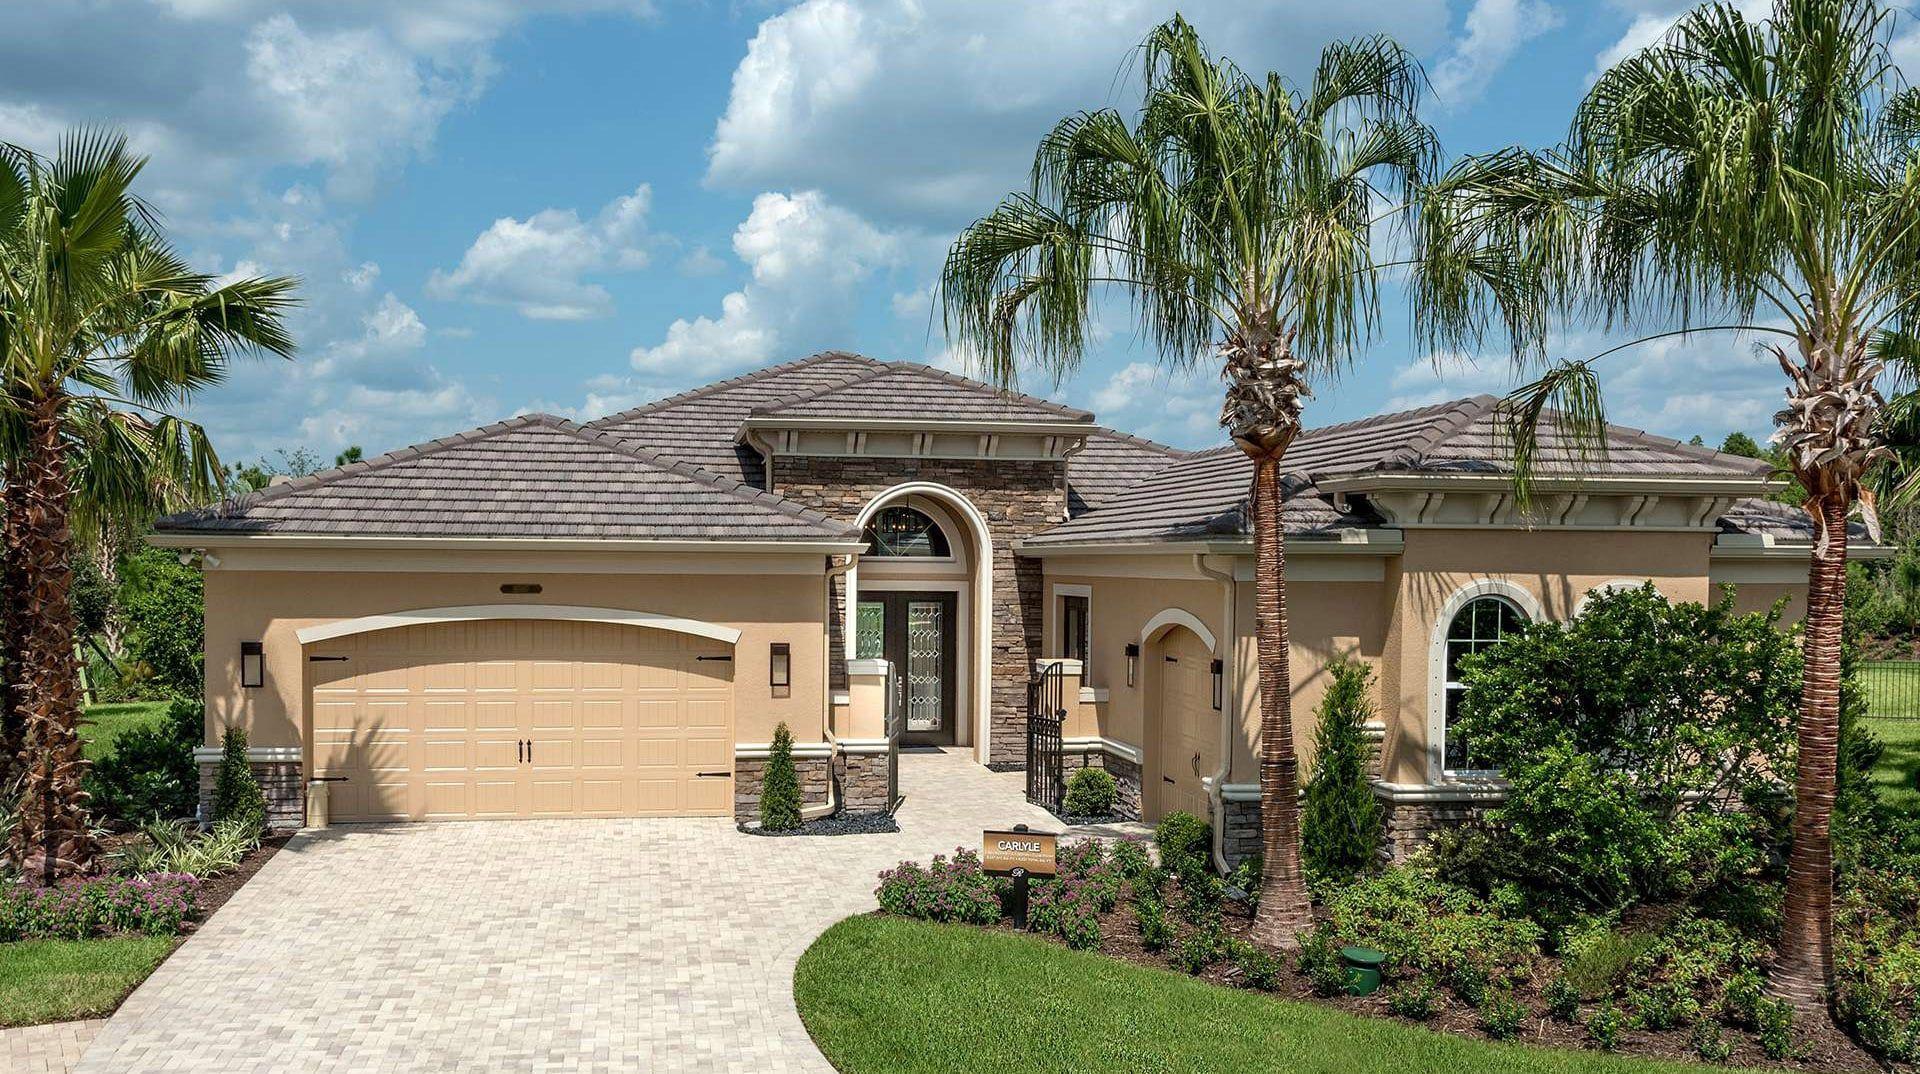 clearwater mortgage, mortgage clearwater, clearwater mortgage rates, clearwater mortgage calculator